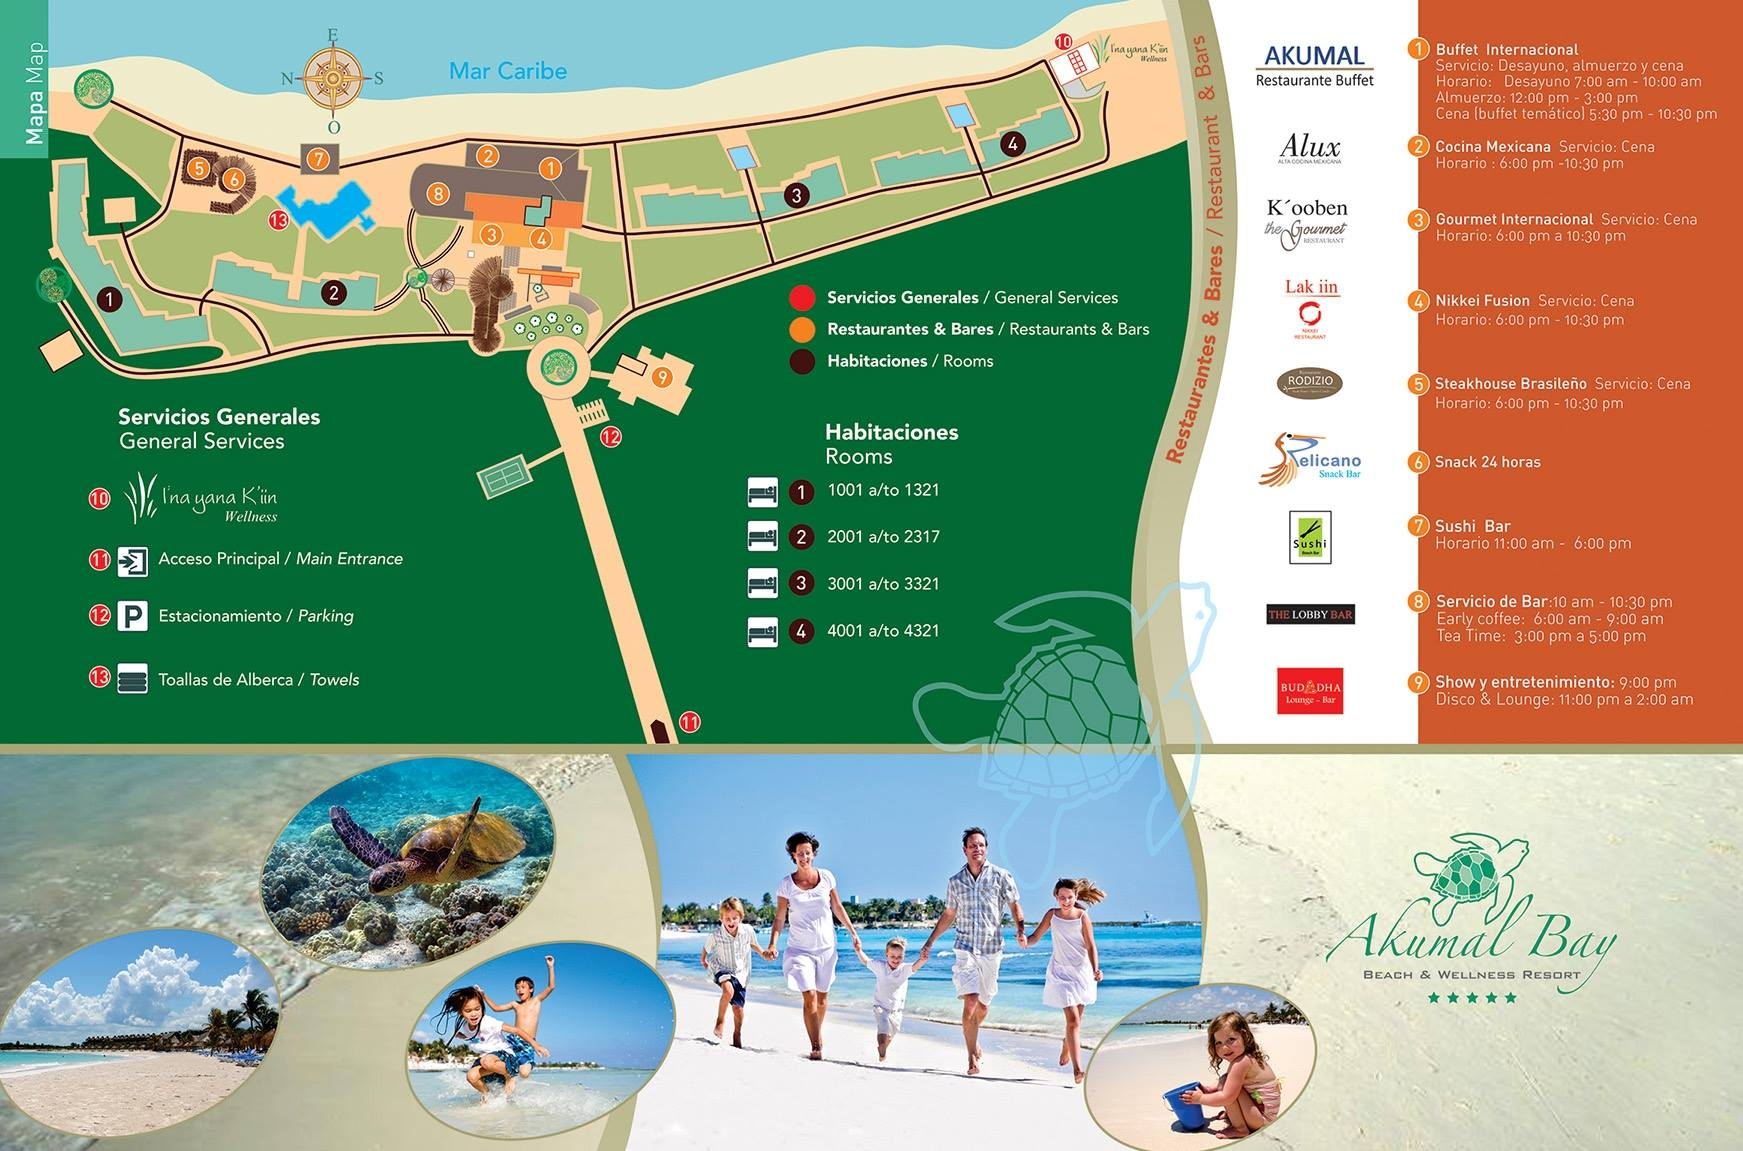 Akumal Bay Beach Amp Wellness Resort Travel By Bob